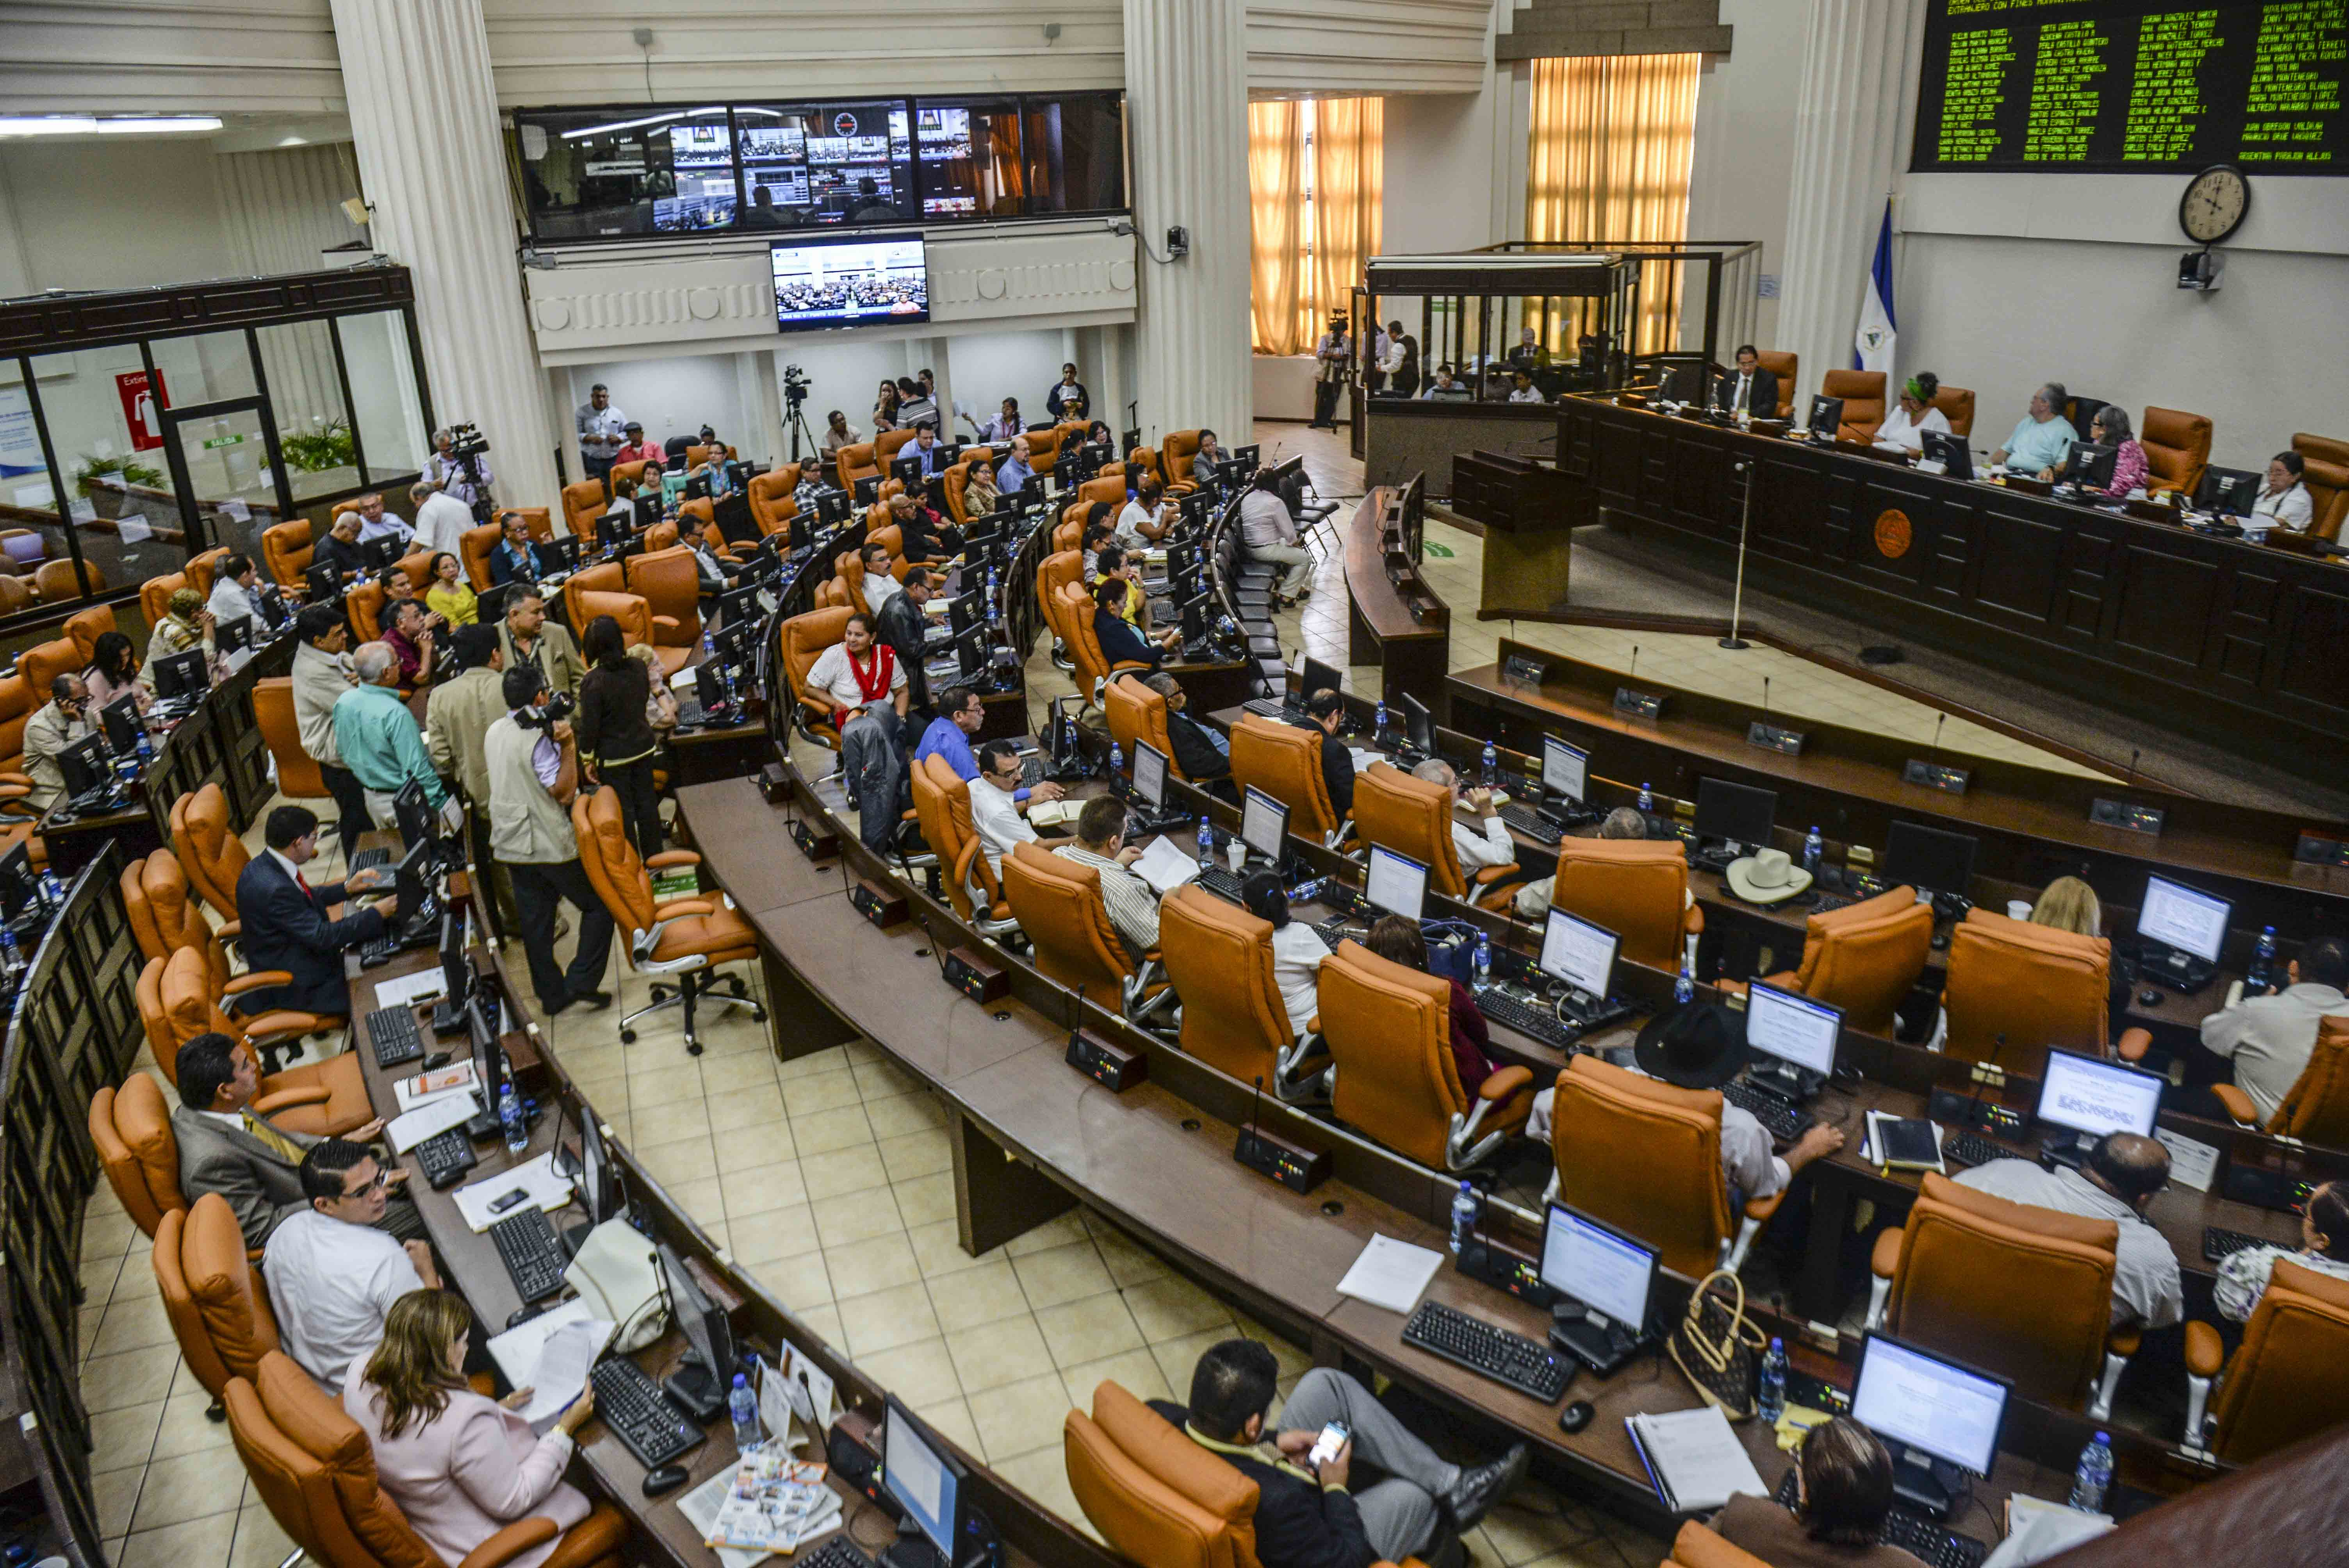 Fondos social de diputados, diputados, leyes, Asamblea Nacional